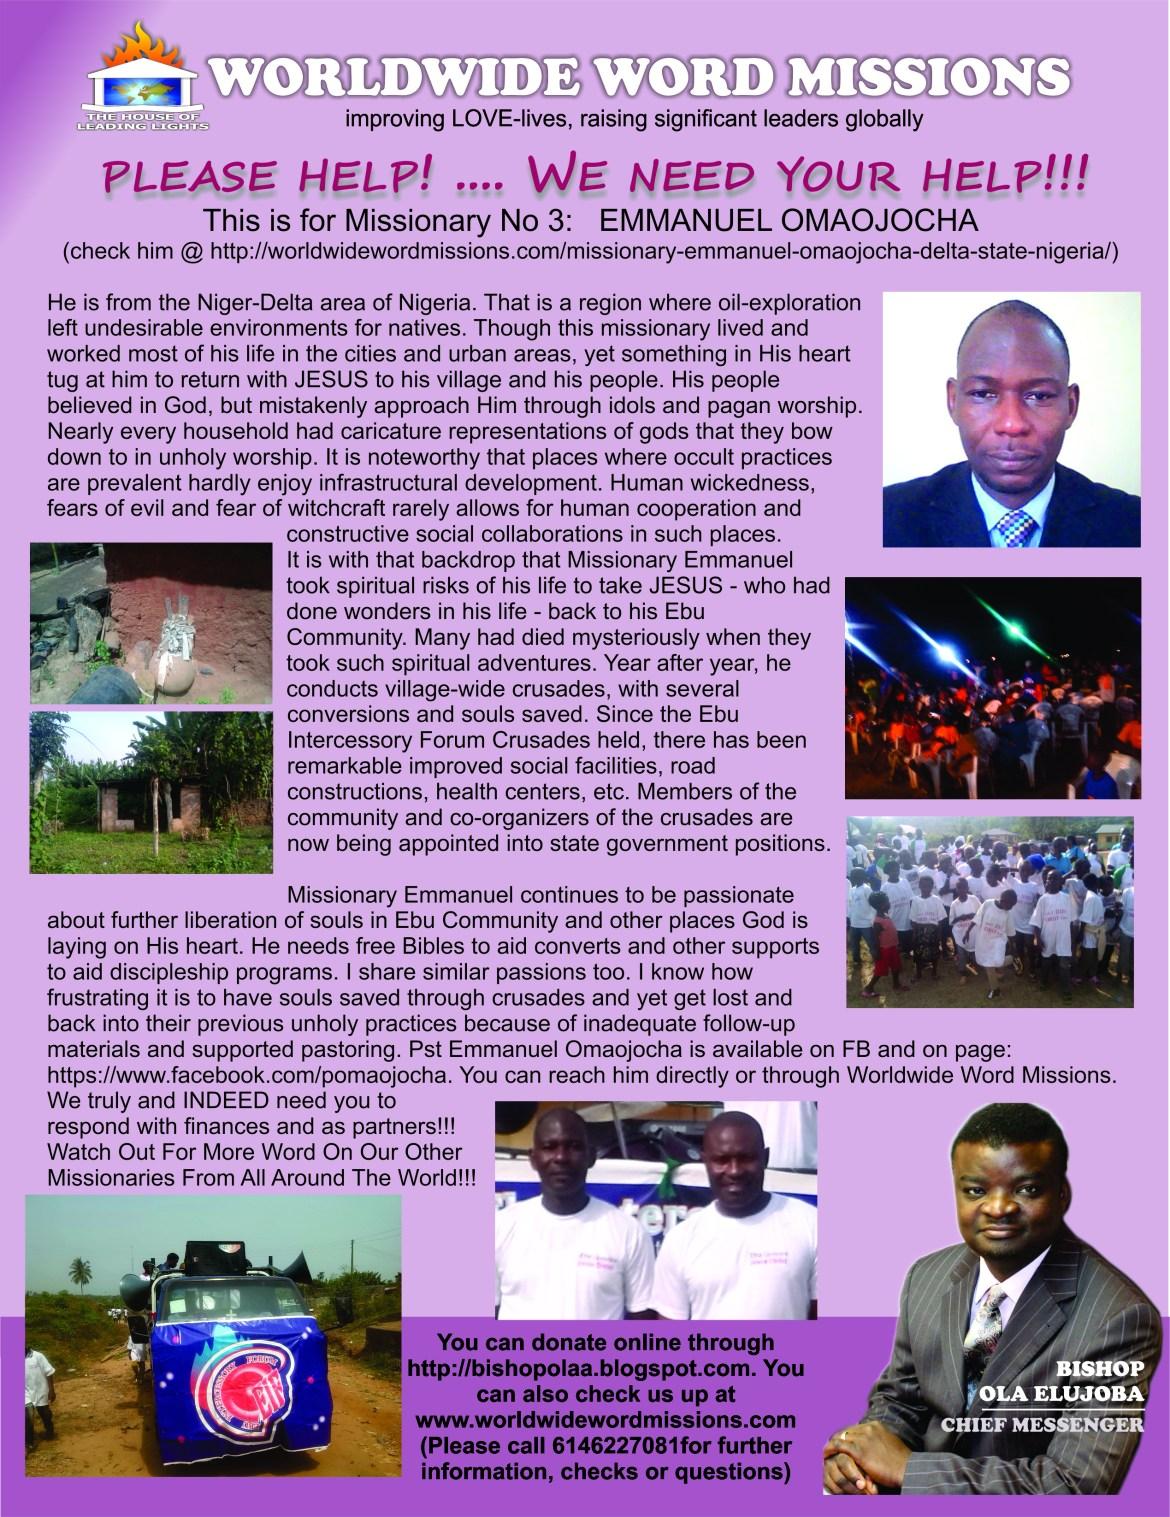 wwwmissions help flier - emmanuel omaojocha